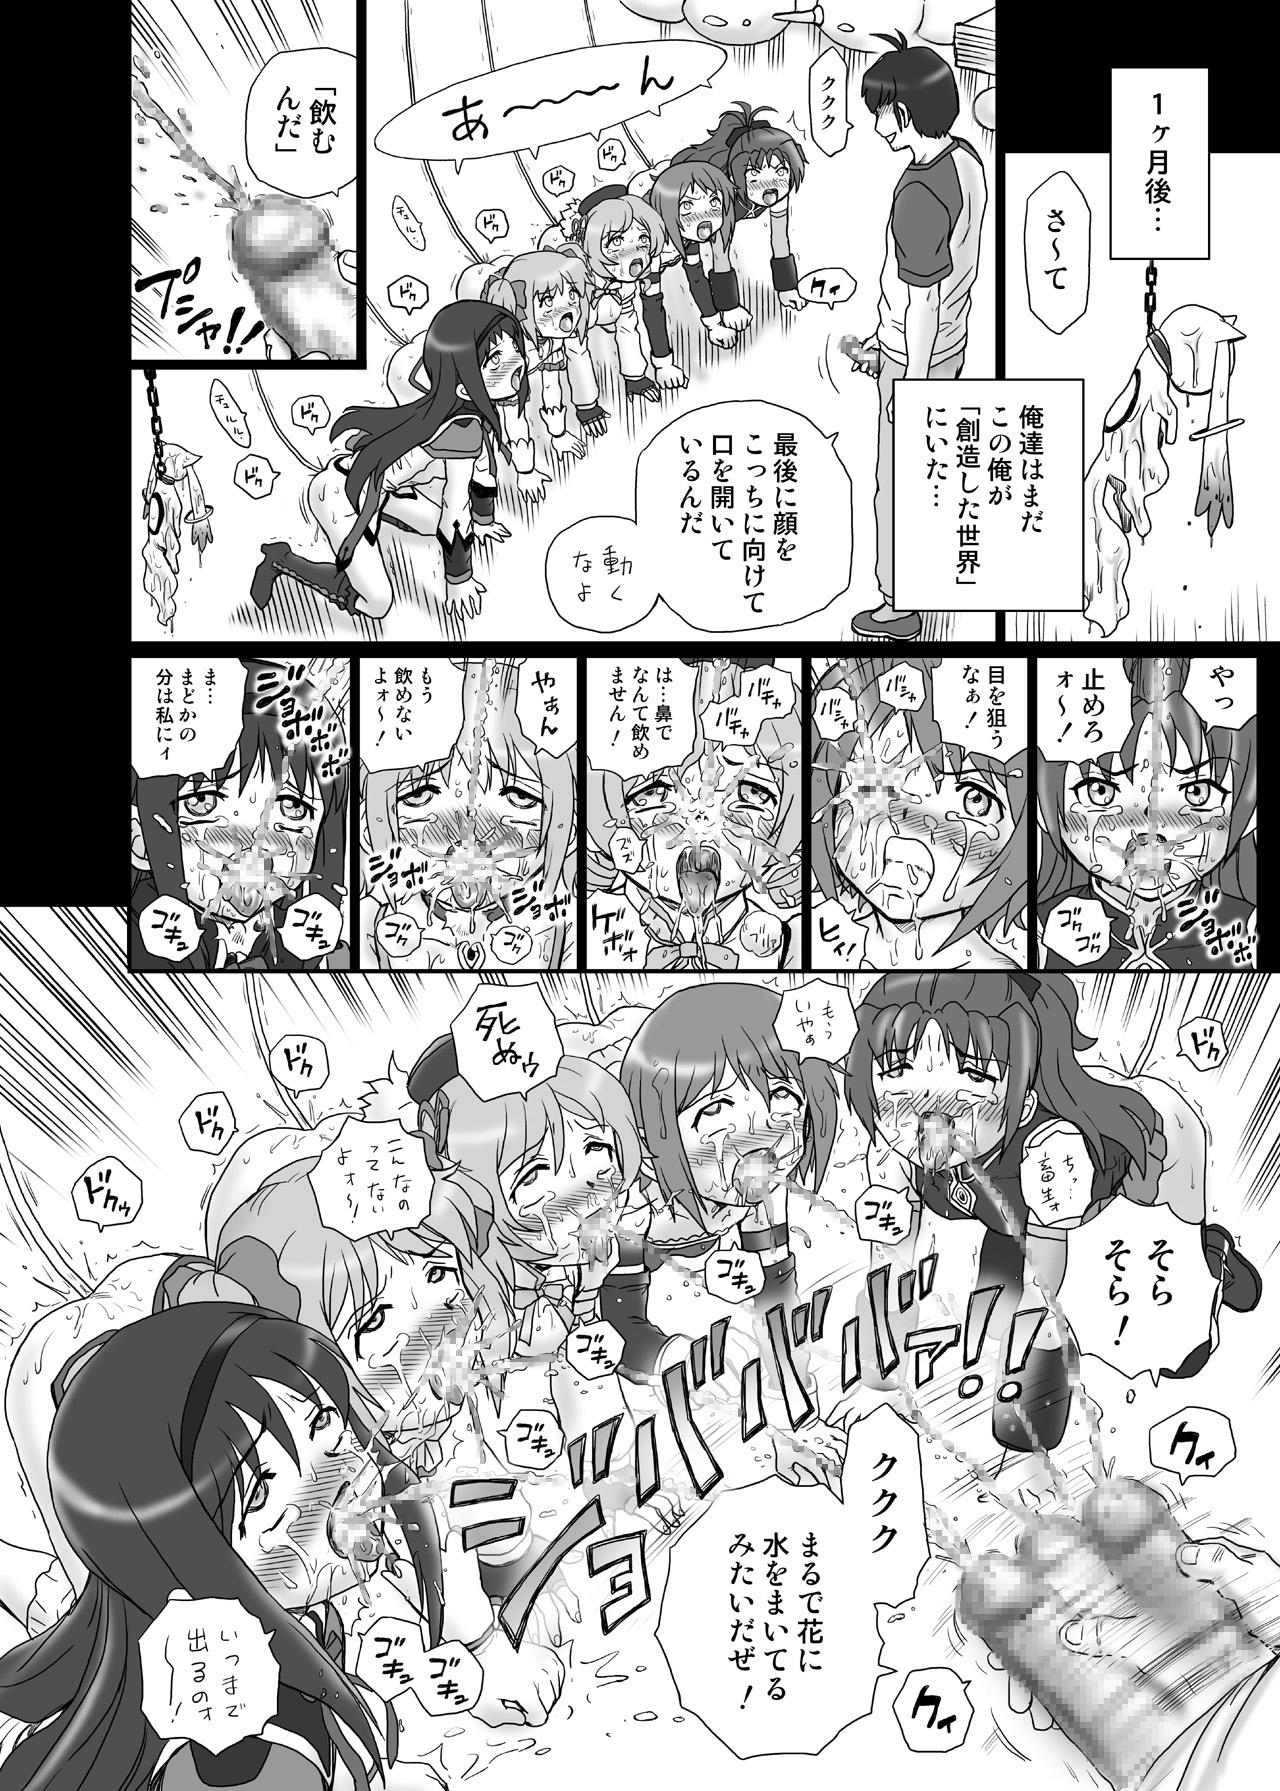 """Mado★Magi"" Anal & Scatolo Sakuhinshuu 30"